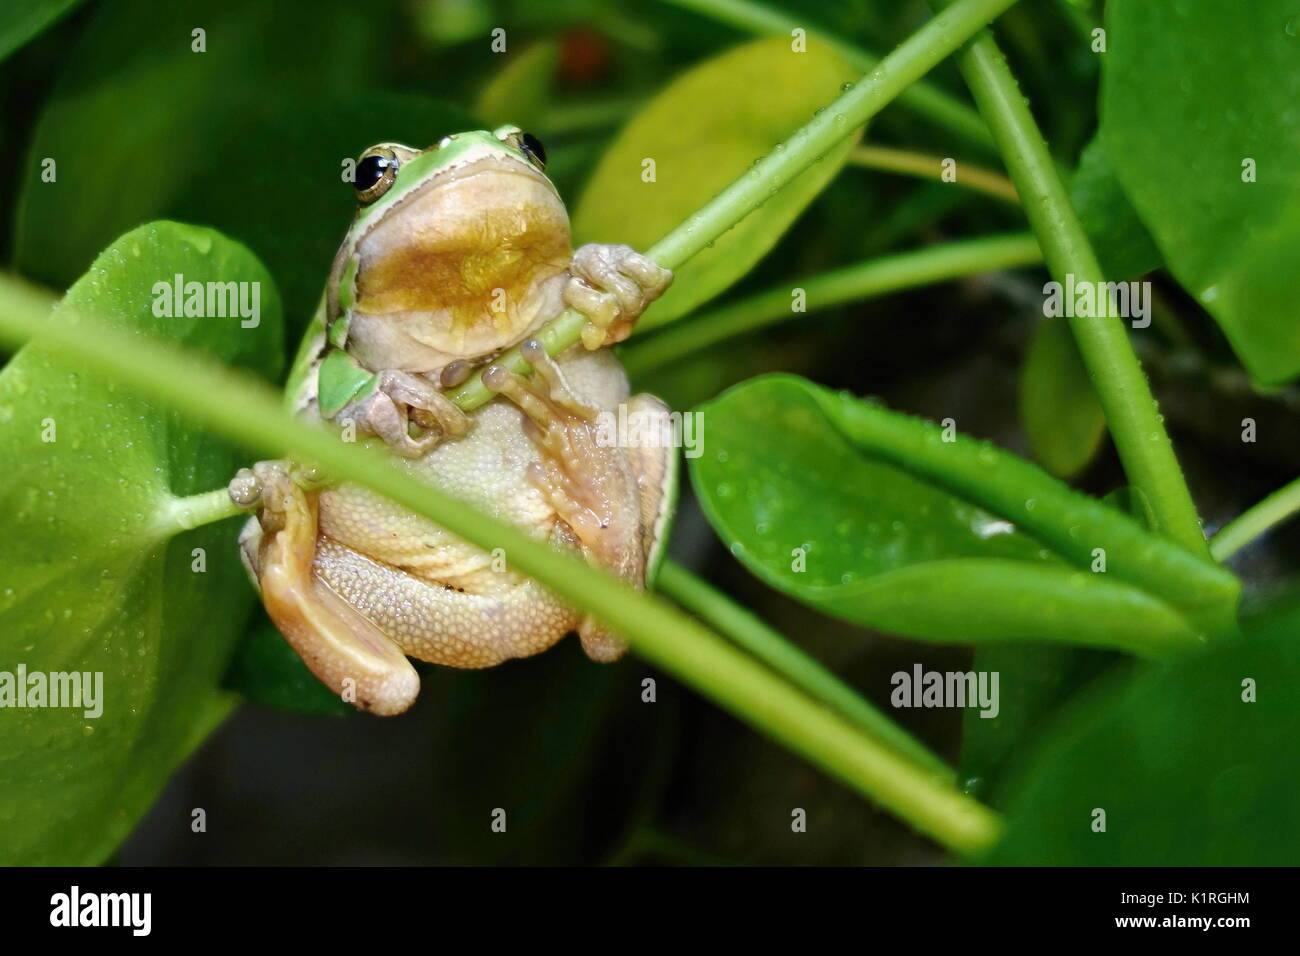 Nice green amphibian European tree frog, Hyla arborea, sitting on grass habitat. - Stock Image